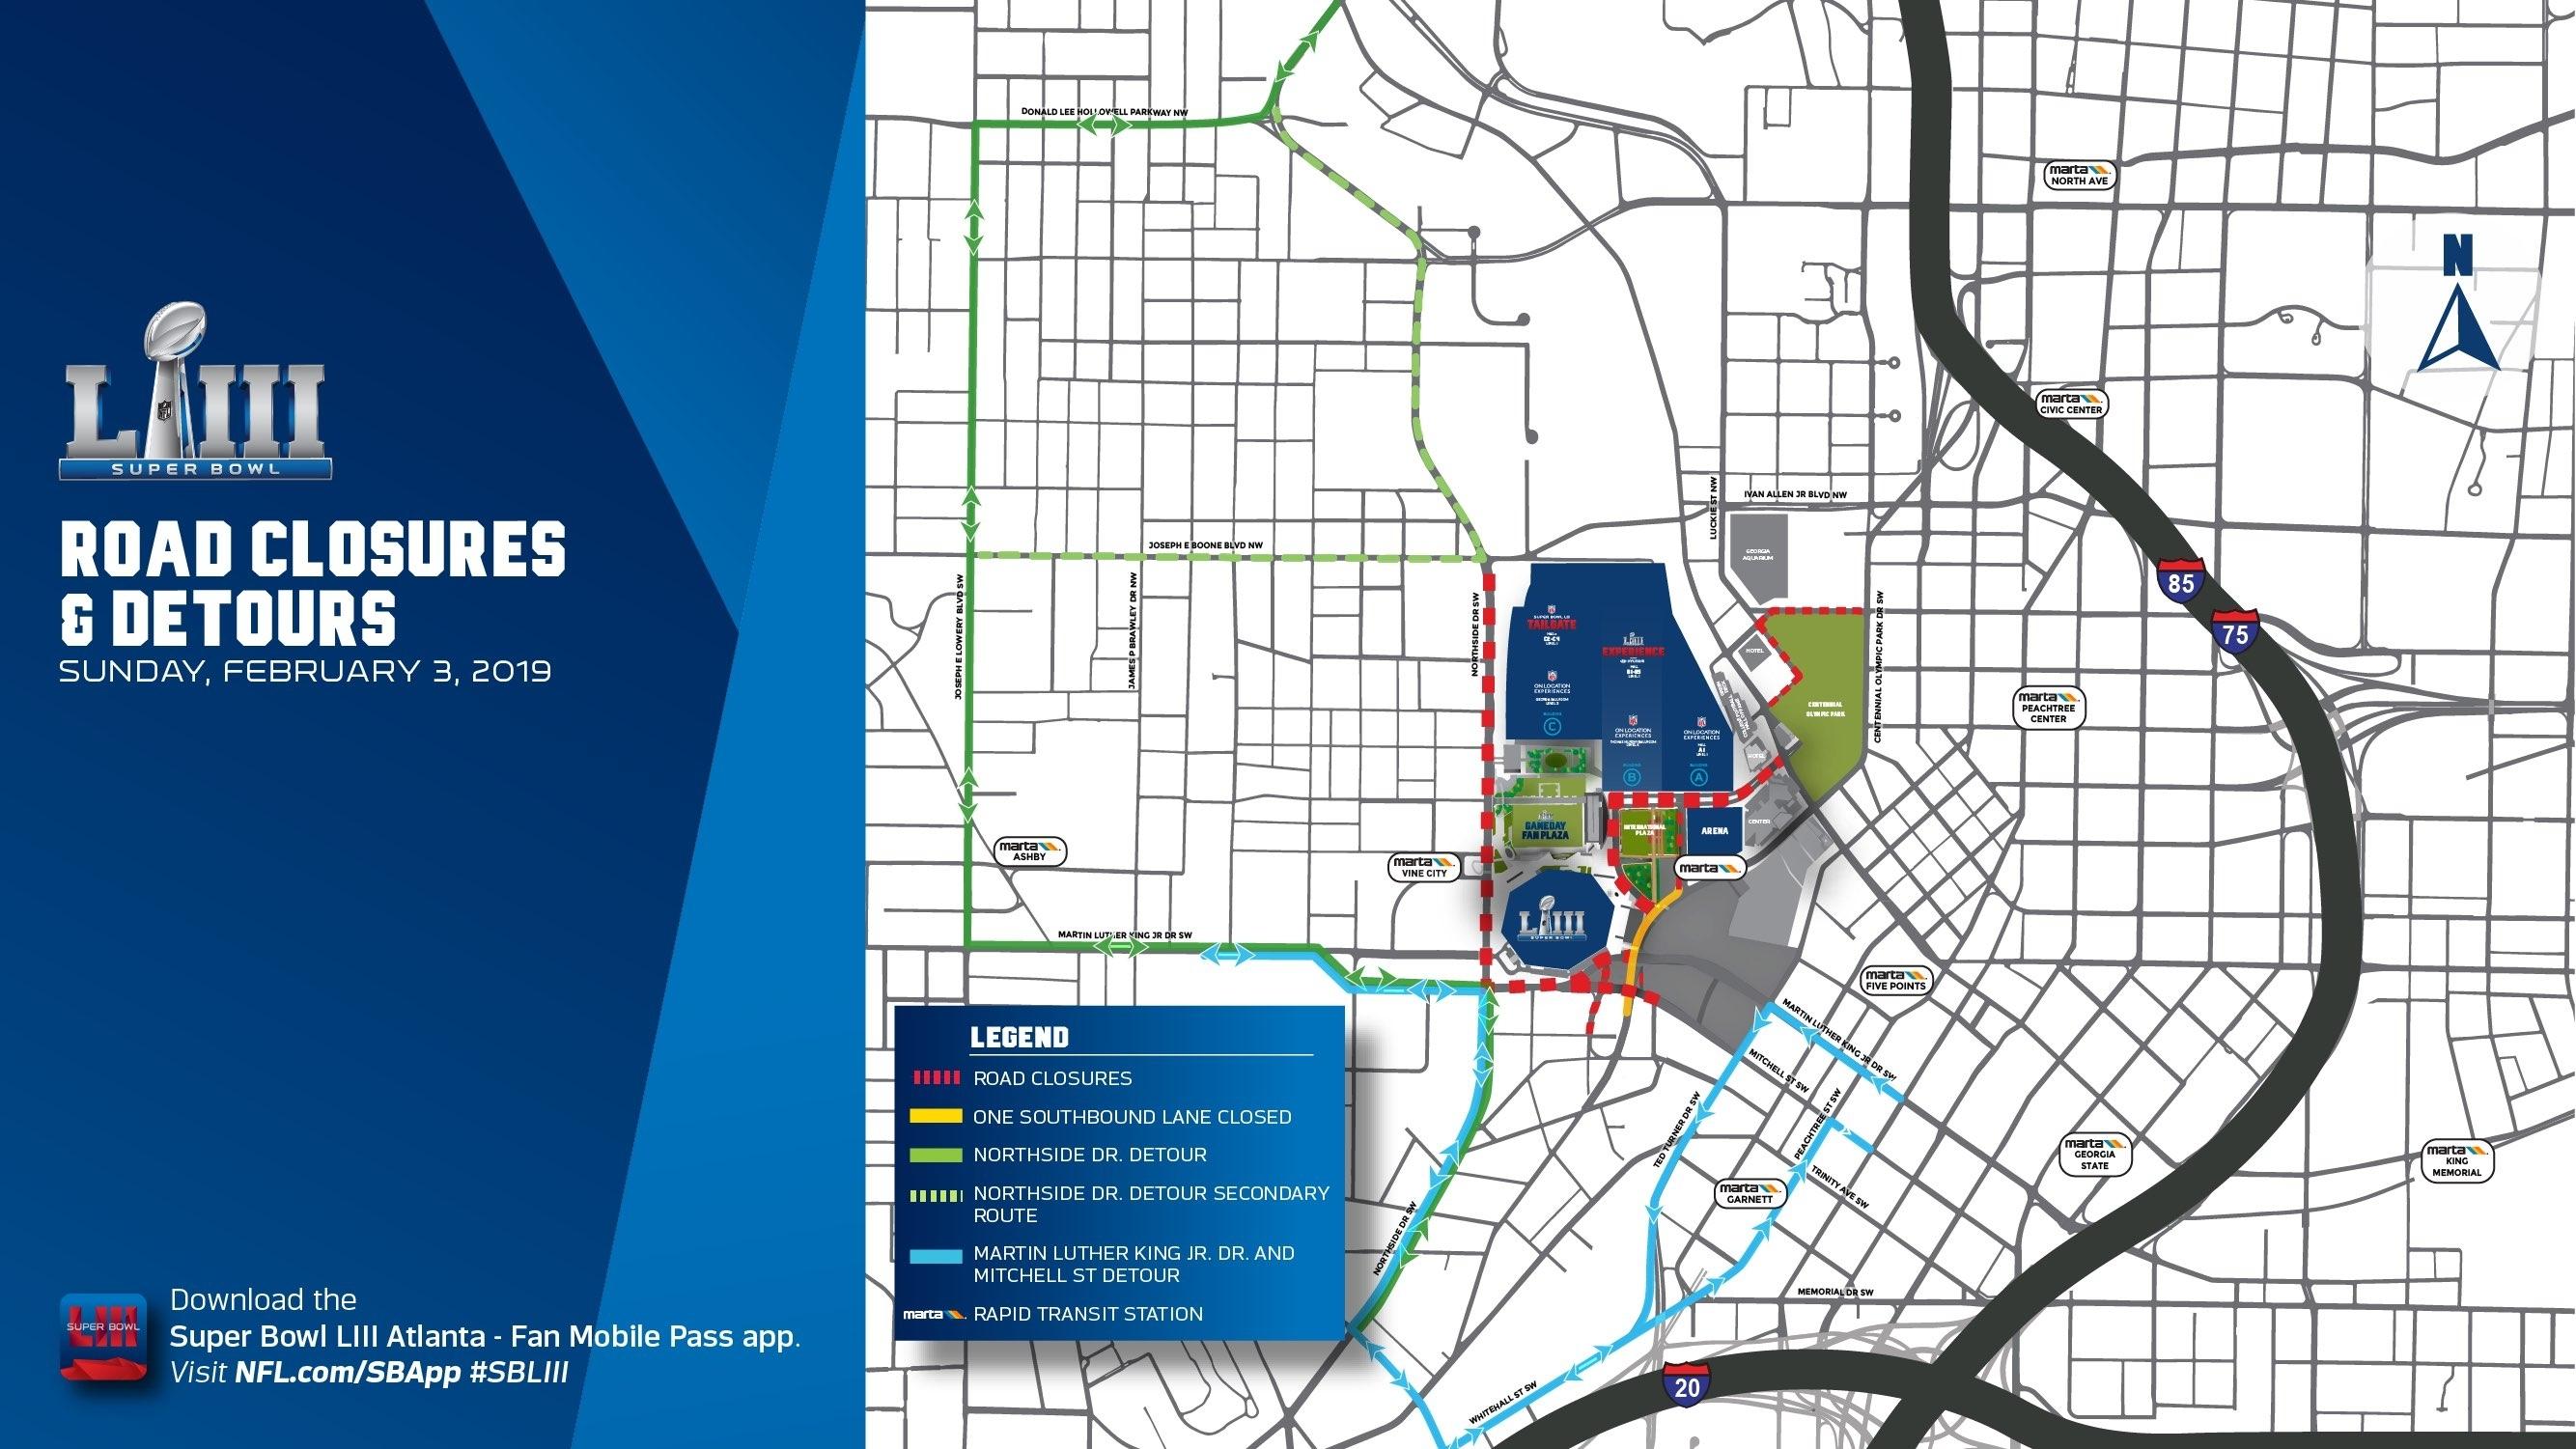 Gameday-Road-Closure-Map Copy - Mercedes Benz Stadium intended for Super Bowl Map Atlanta